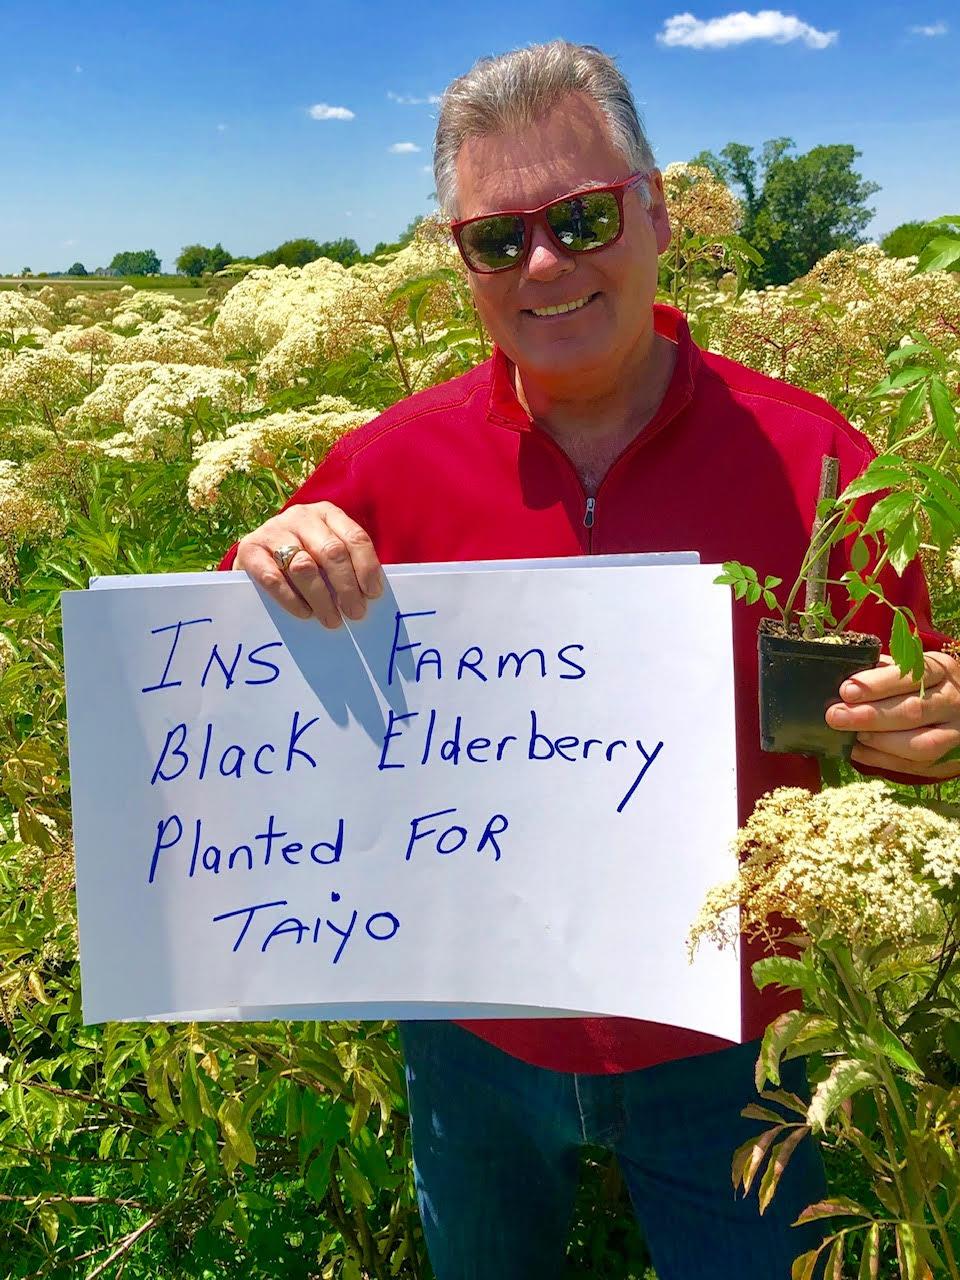 Plant-Elderberry-Taiyo.jpg